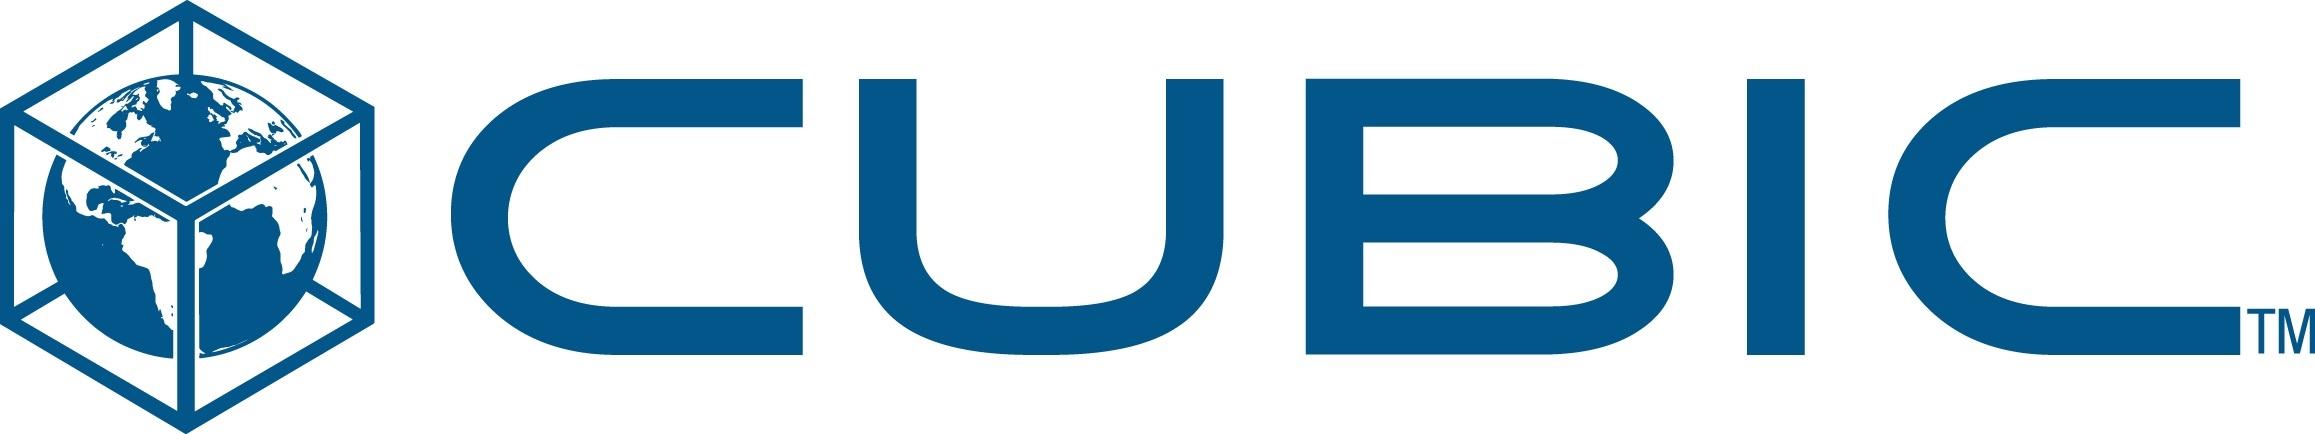 2014 Cubic logo_7462 TM.jpg